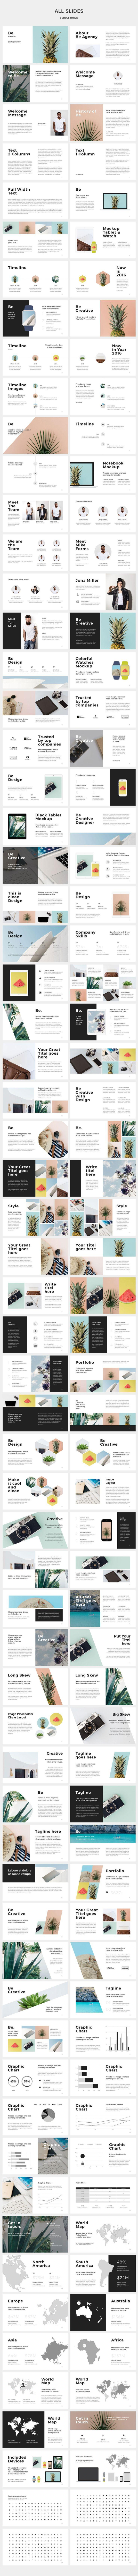 Be Powerpoint Presentation +30Photos by Dake Made on @creativemarket